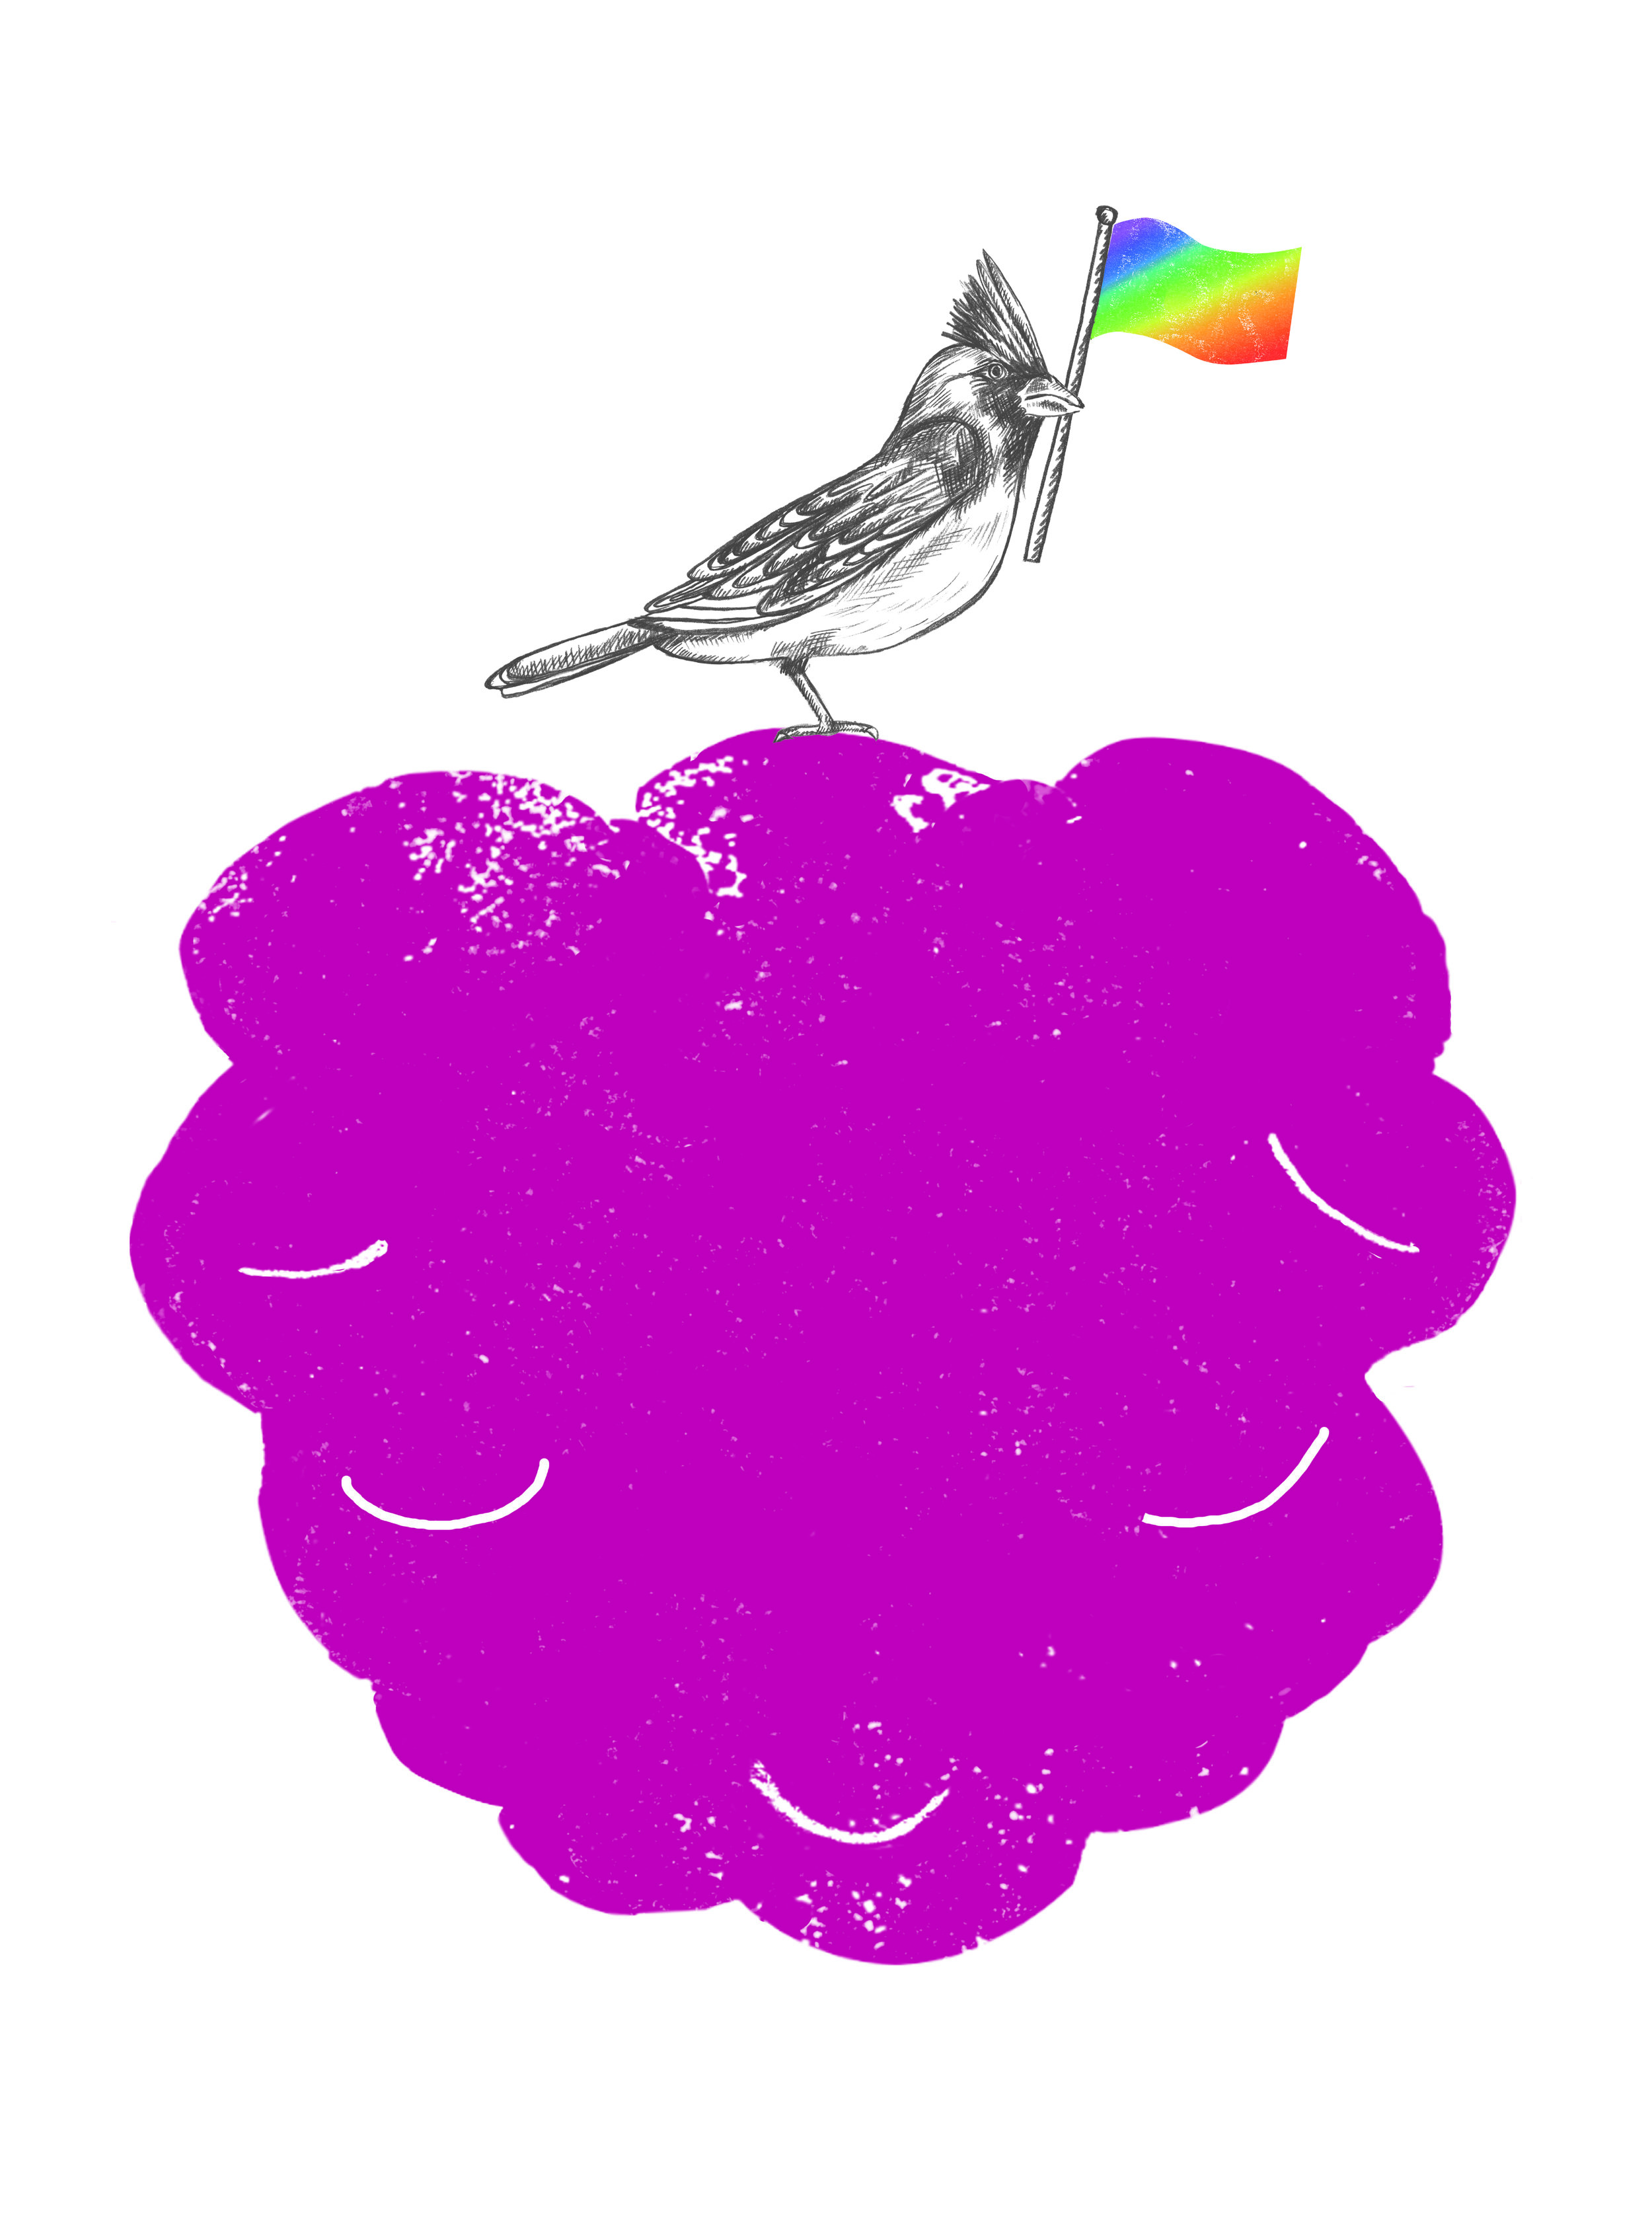 Airline Pot_Summer Berry Posset_Front Illustration (1).jpg